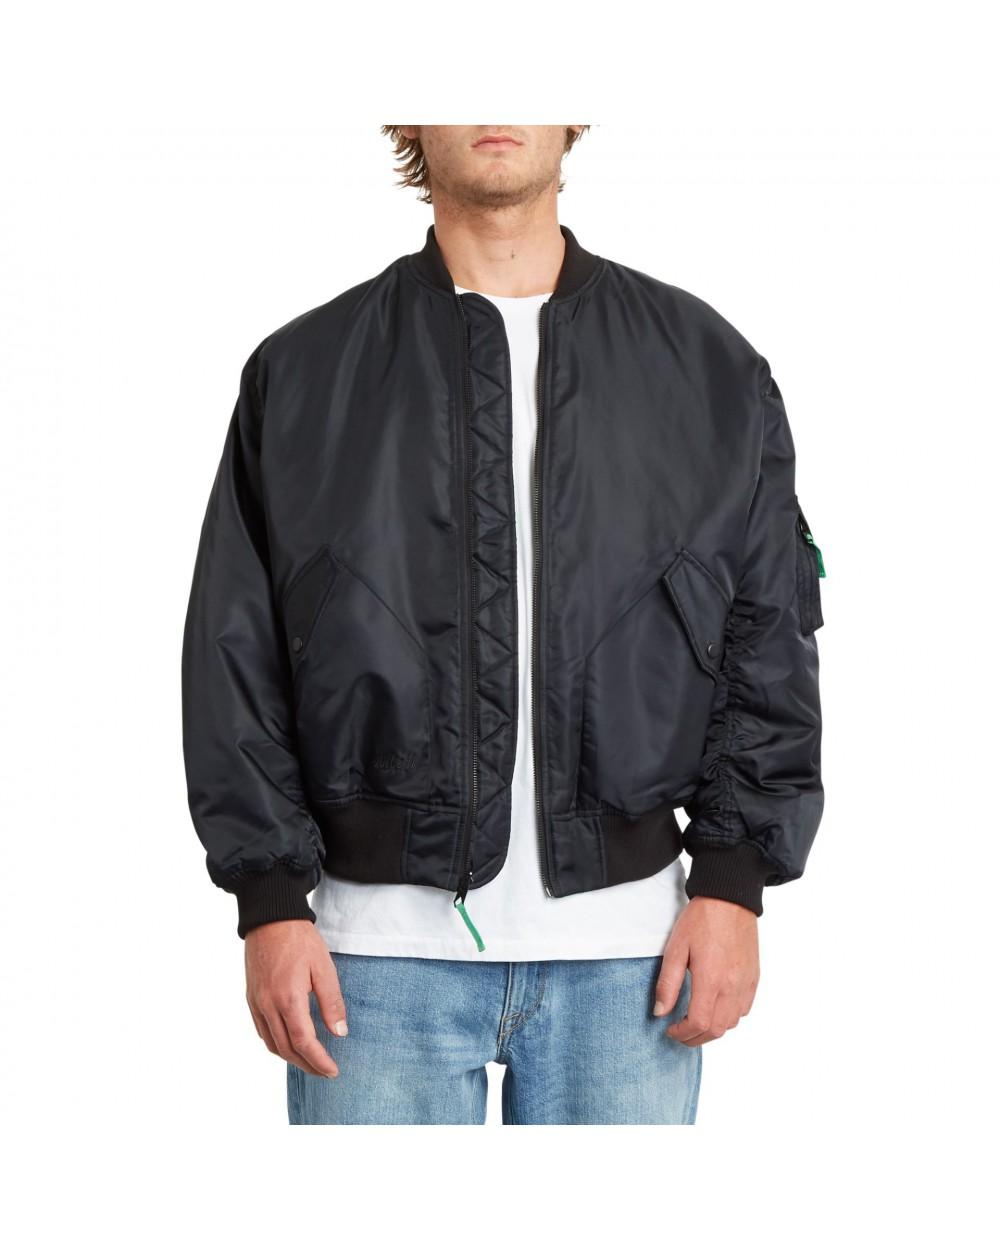 Volcom Greenfuzz Jacket - Black